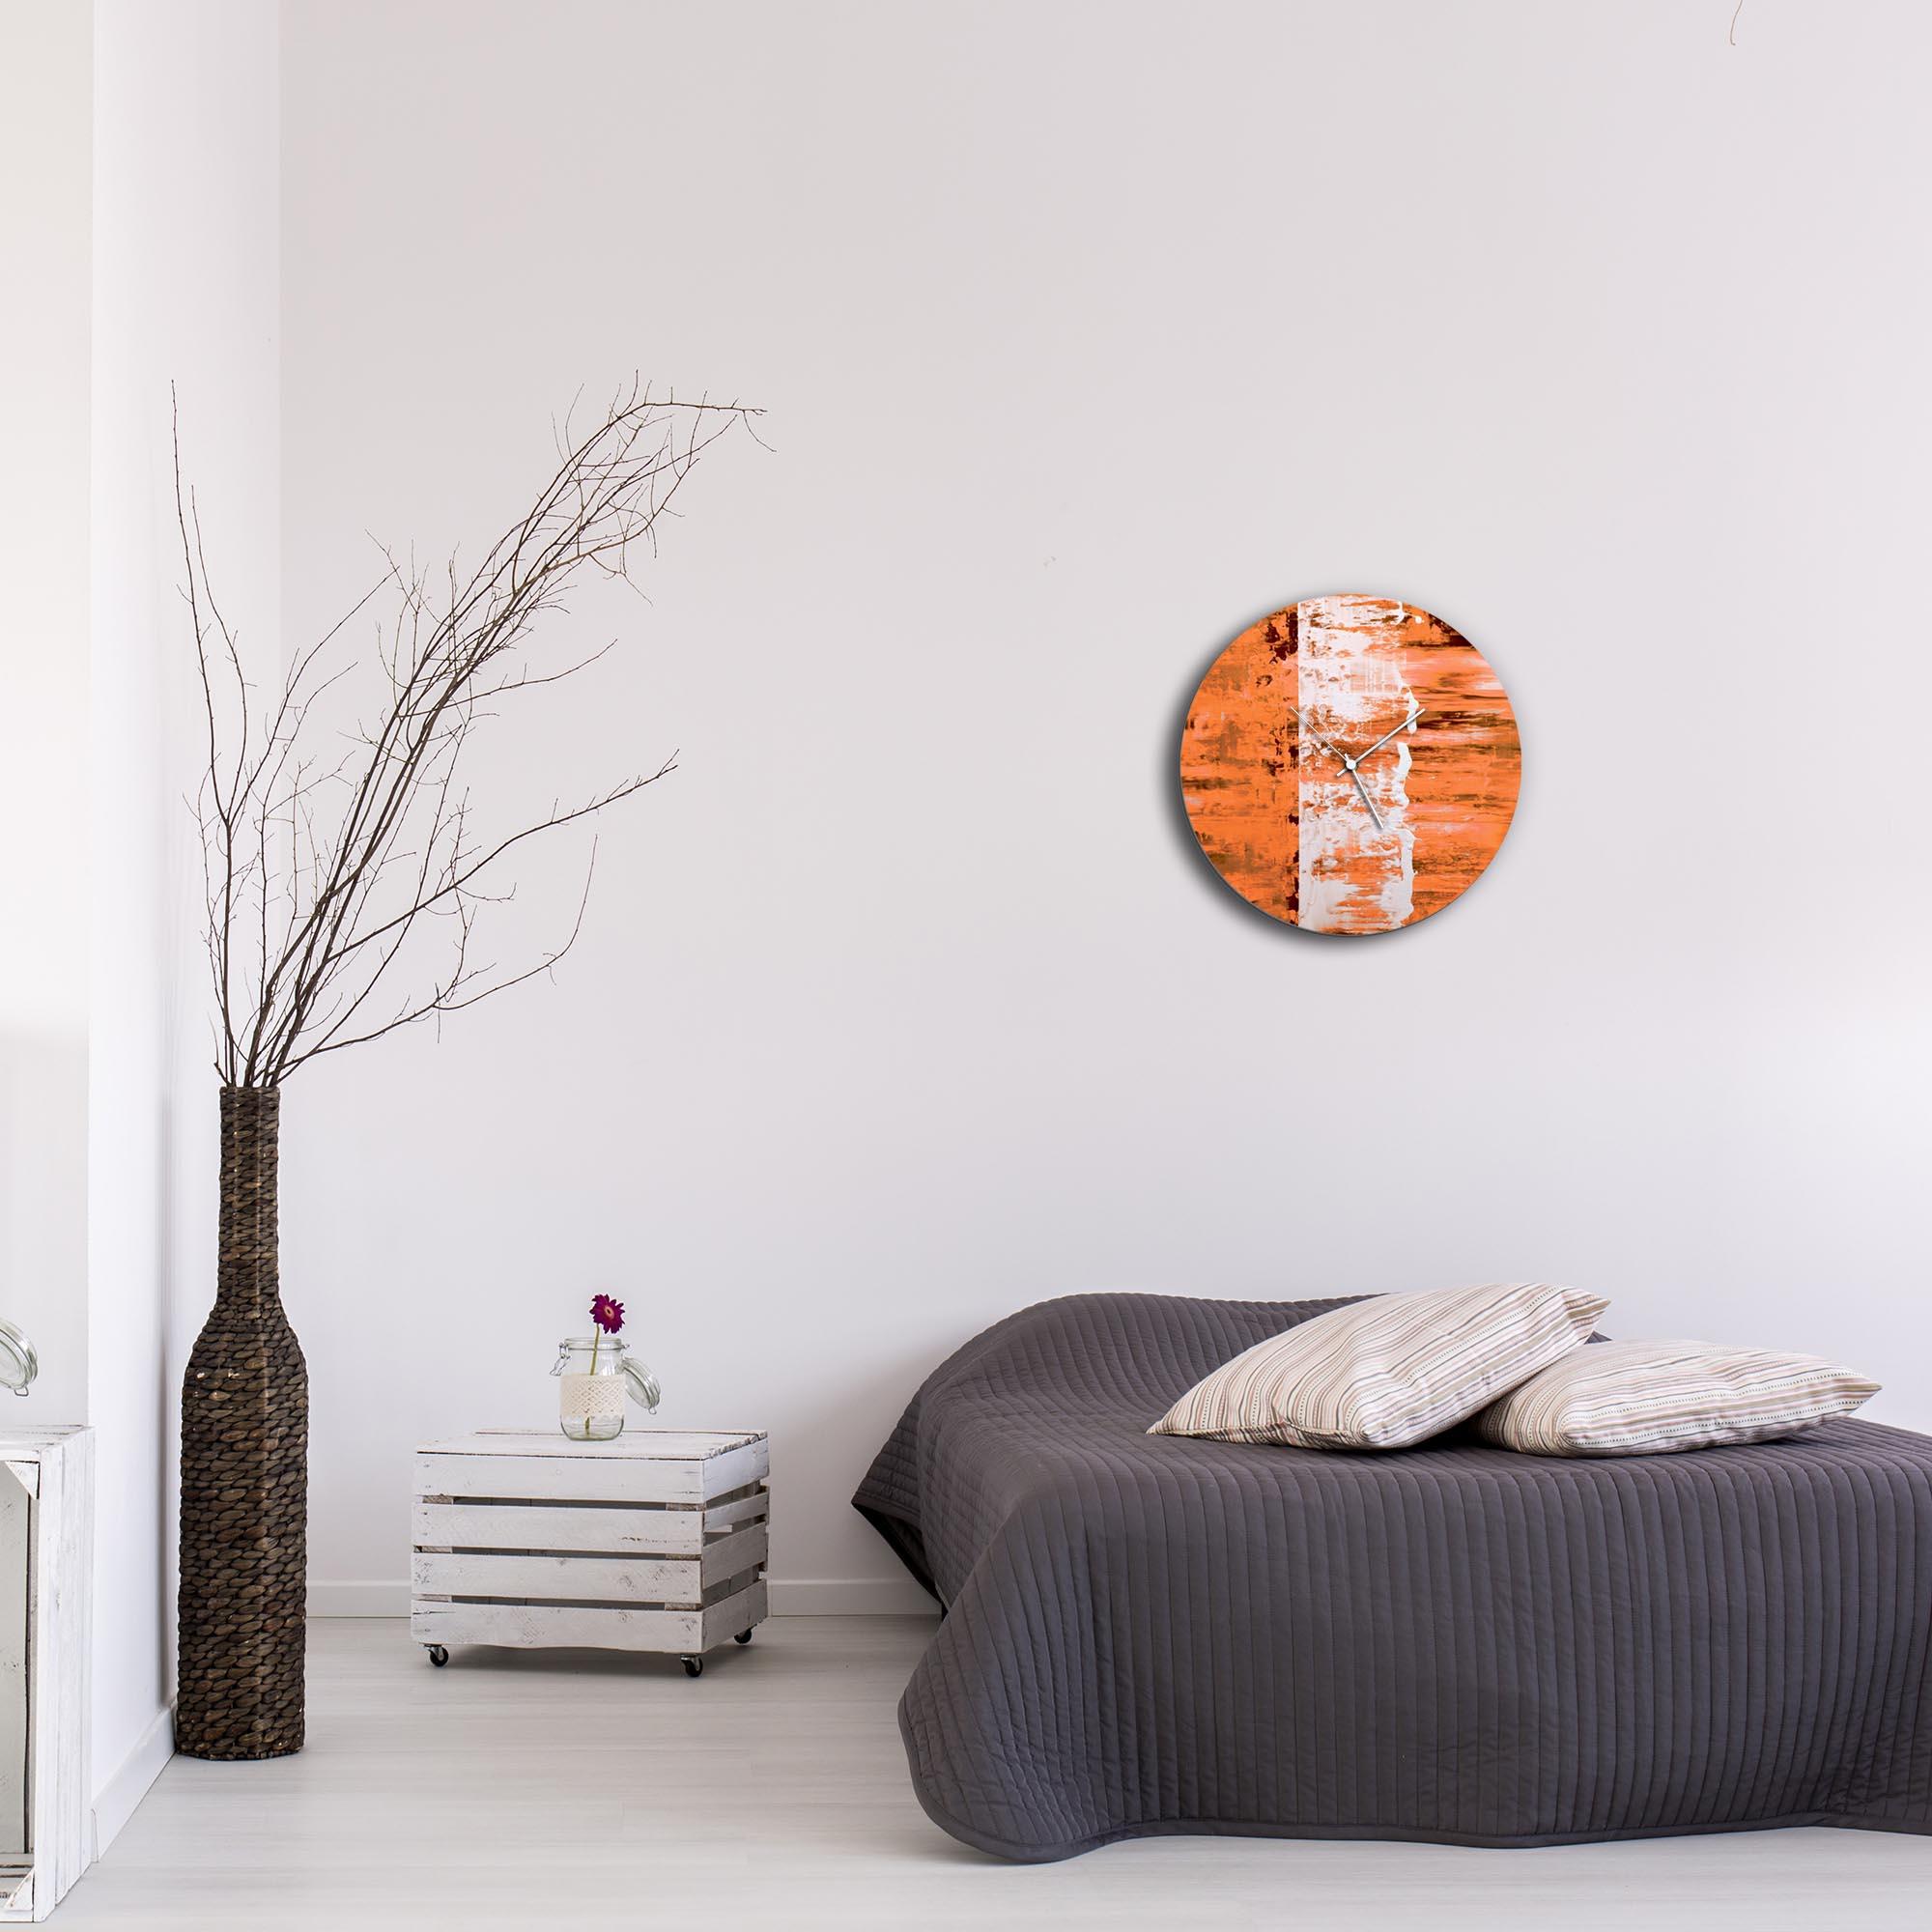 Orange Street Circle Clock by Mendo Vasilevski - Urban Abstract Home Decor - Lifestyle View